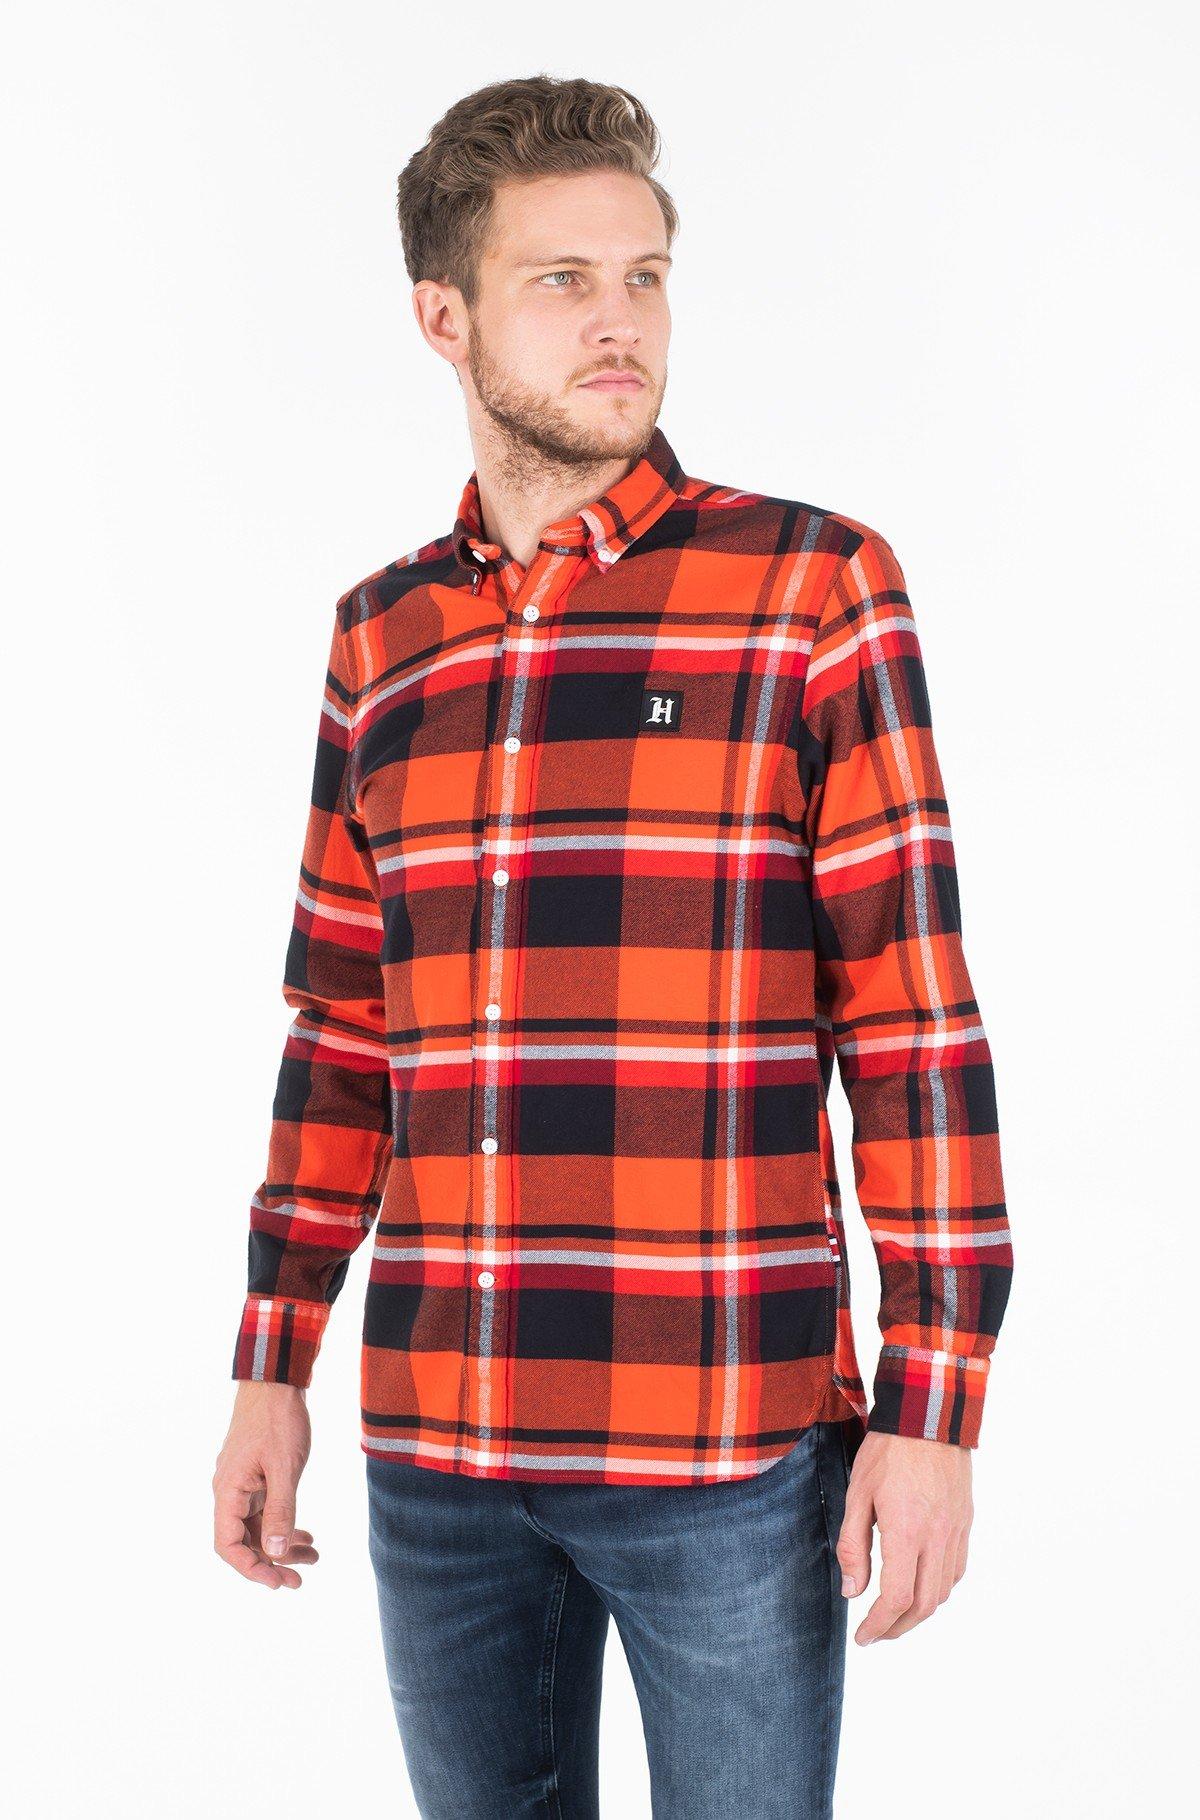 Marškiniai LH CHECK SHIRT-full-1